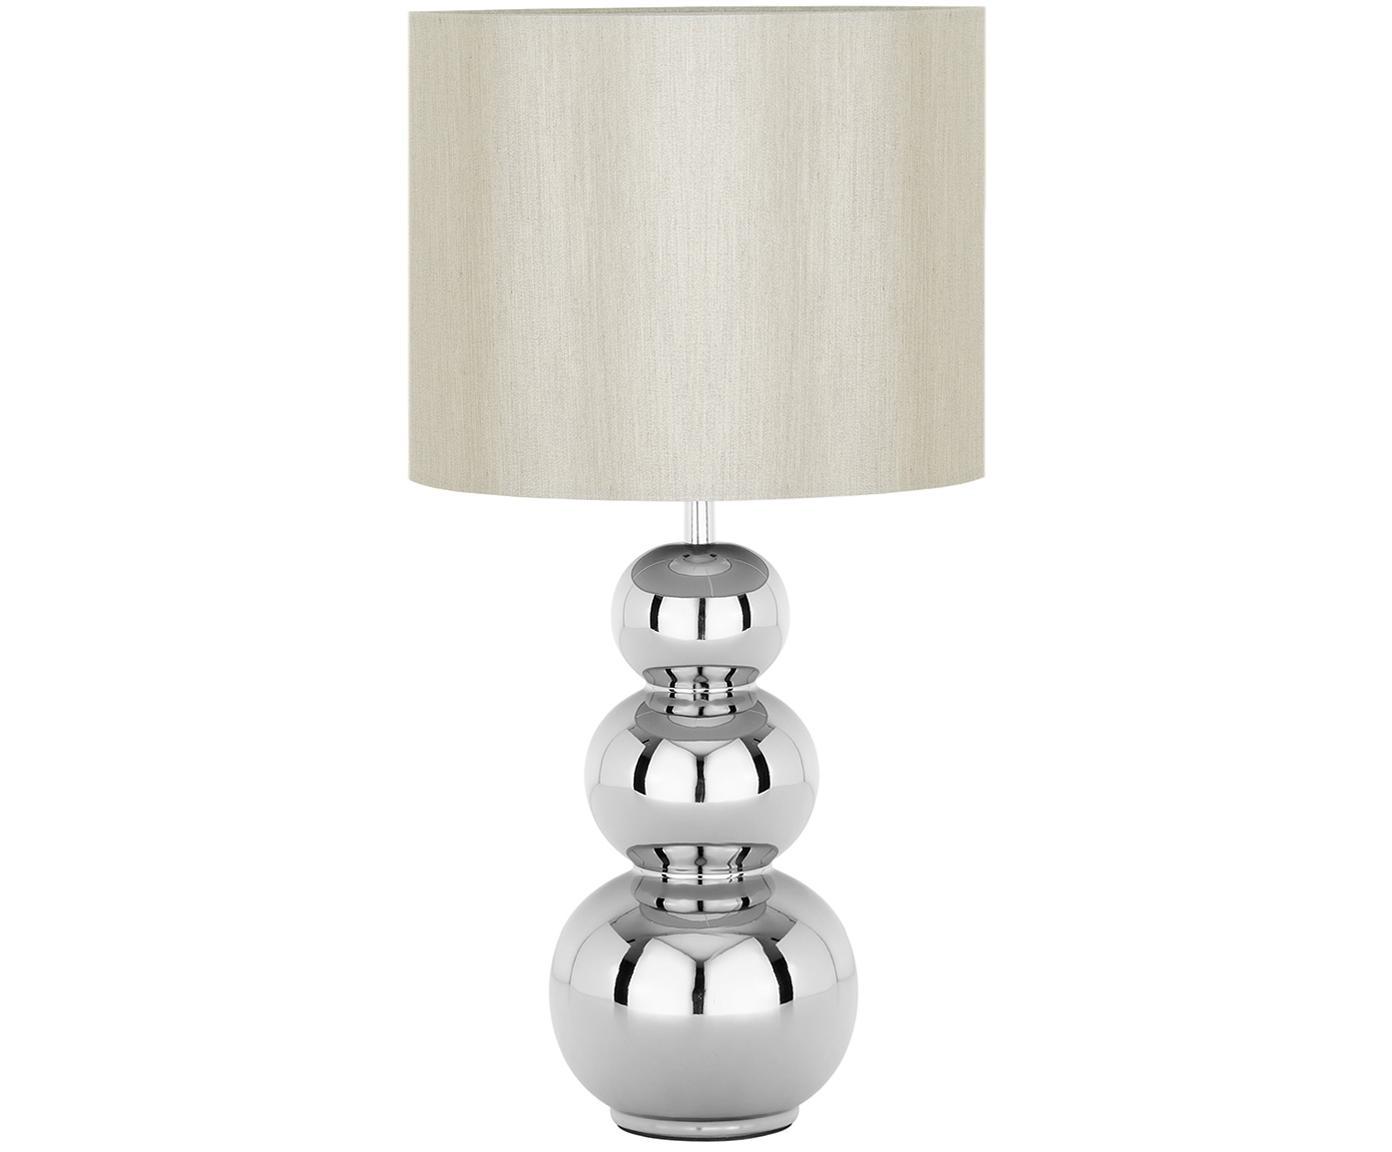 Lampa stołowa Regina, Taupe, srebrny, Ø 25 x W 49 cm